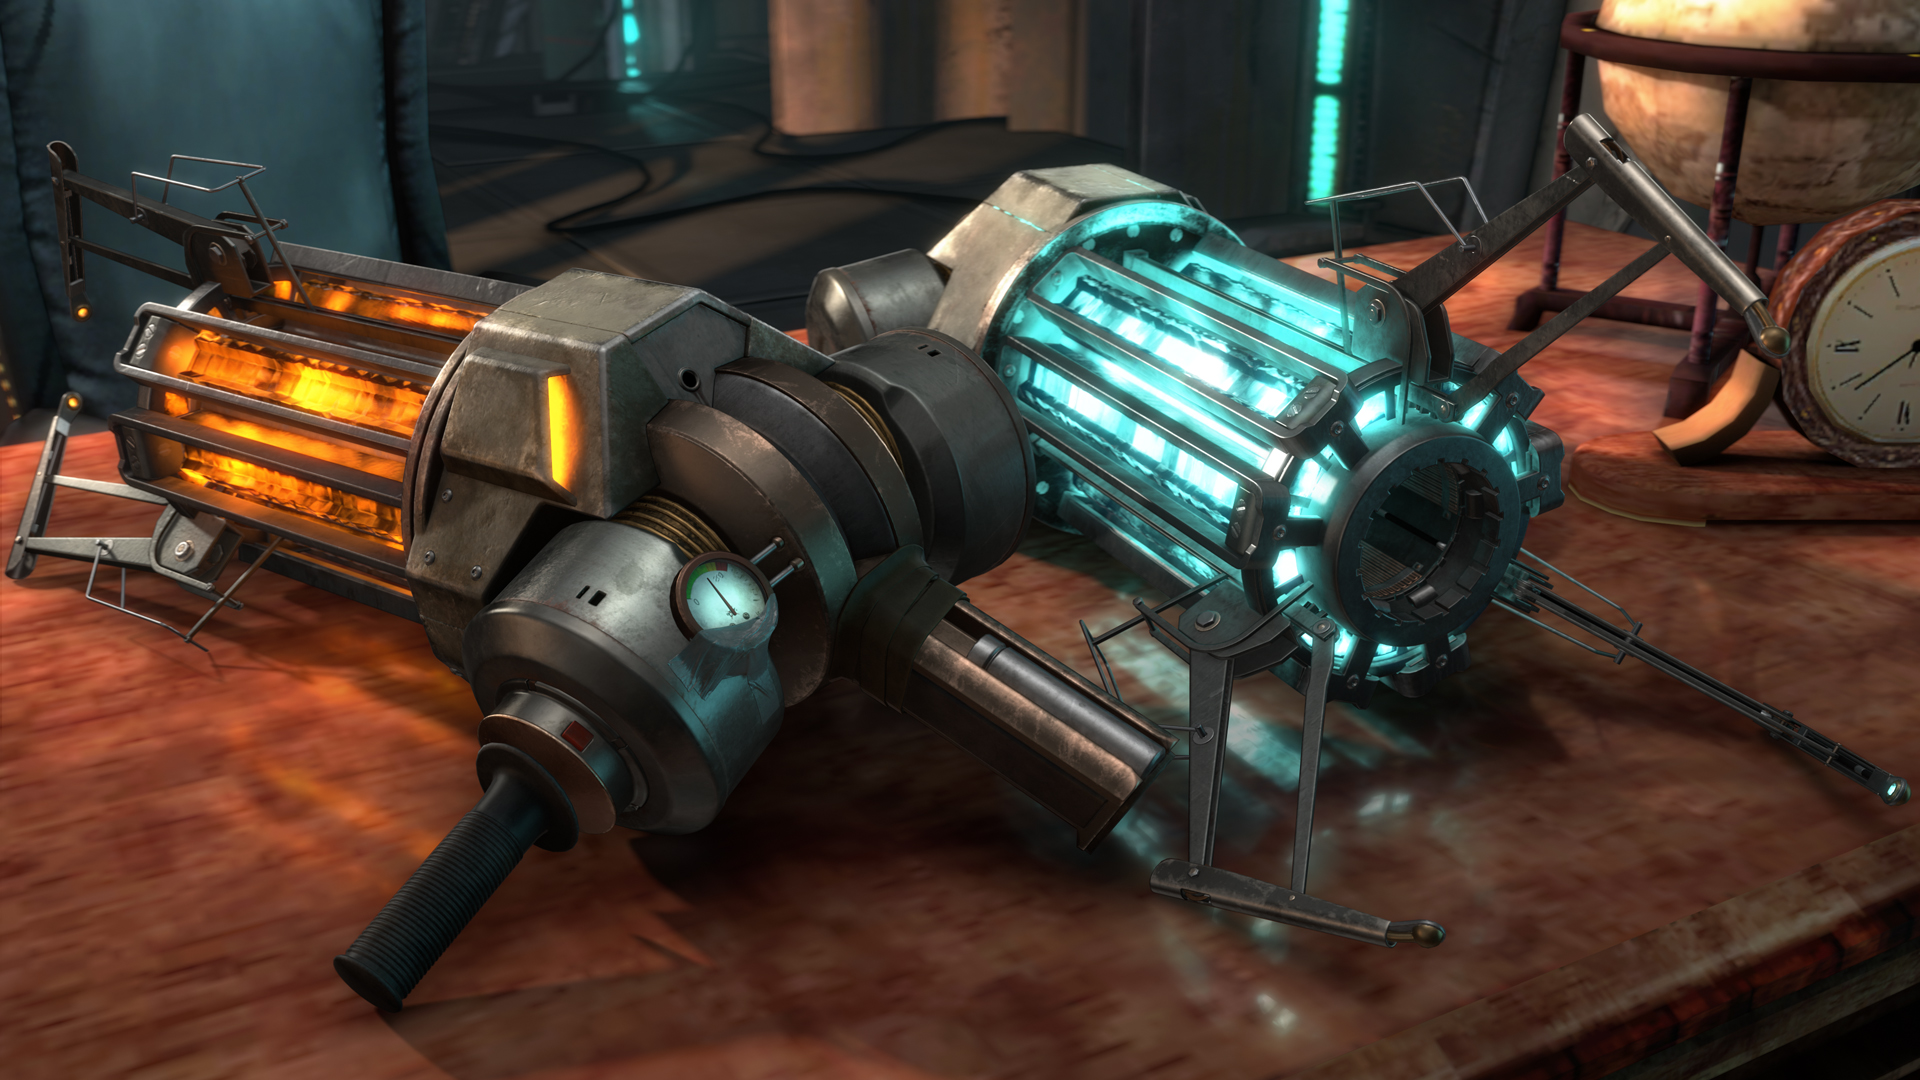 Gravity Gun remodel for Hl2, Garrysmod, and Sfm - Developers ...